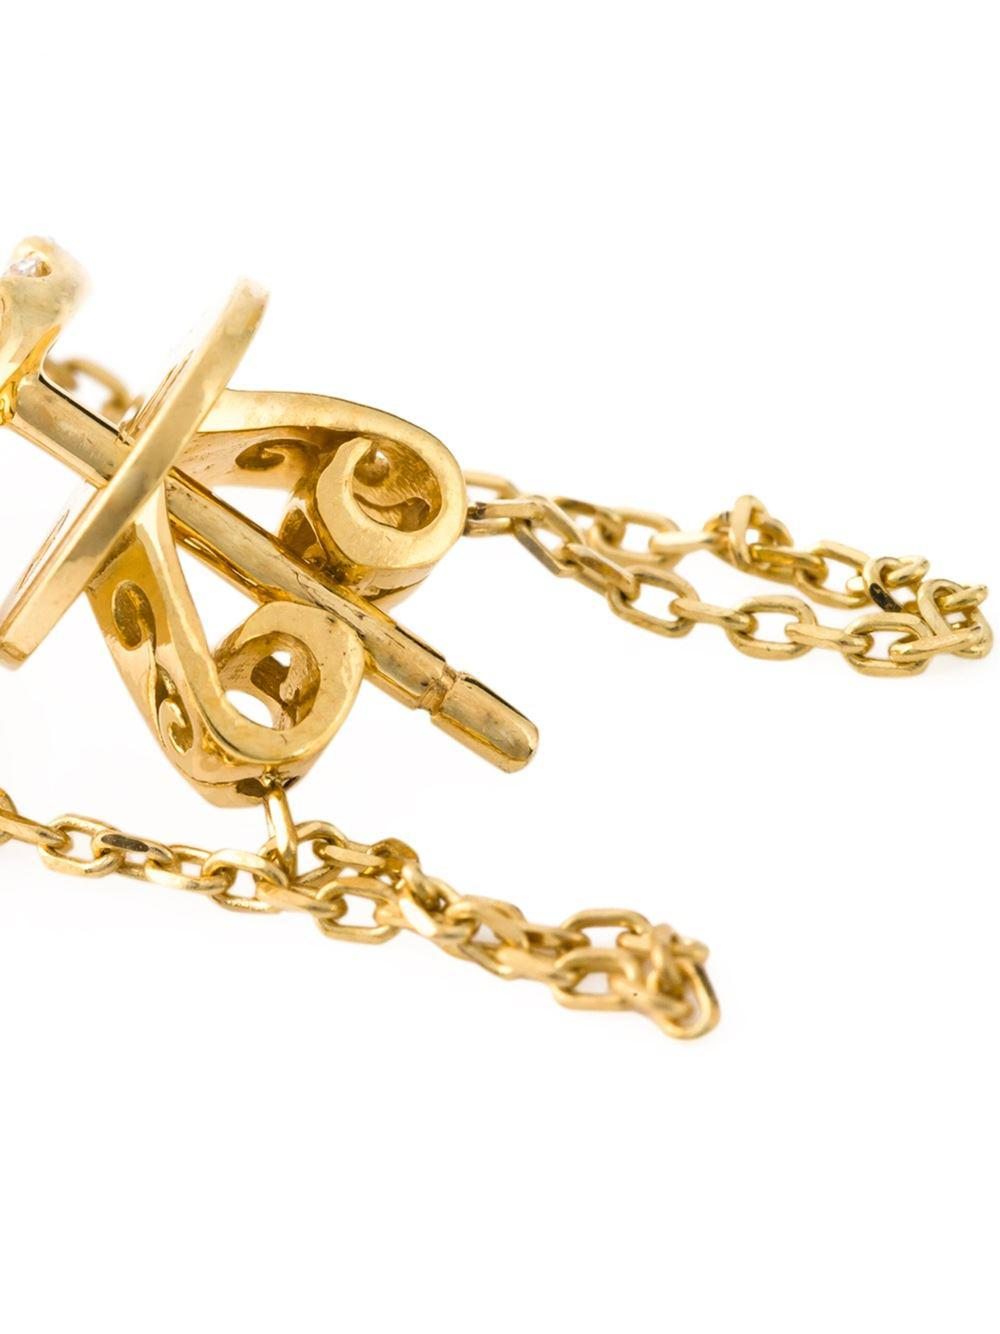 Eshvi April earrings - Metallic rVOHFcrO